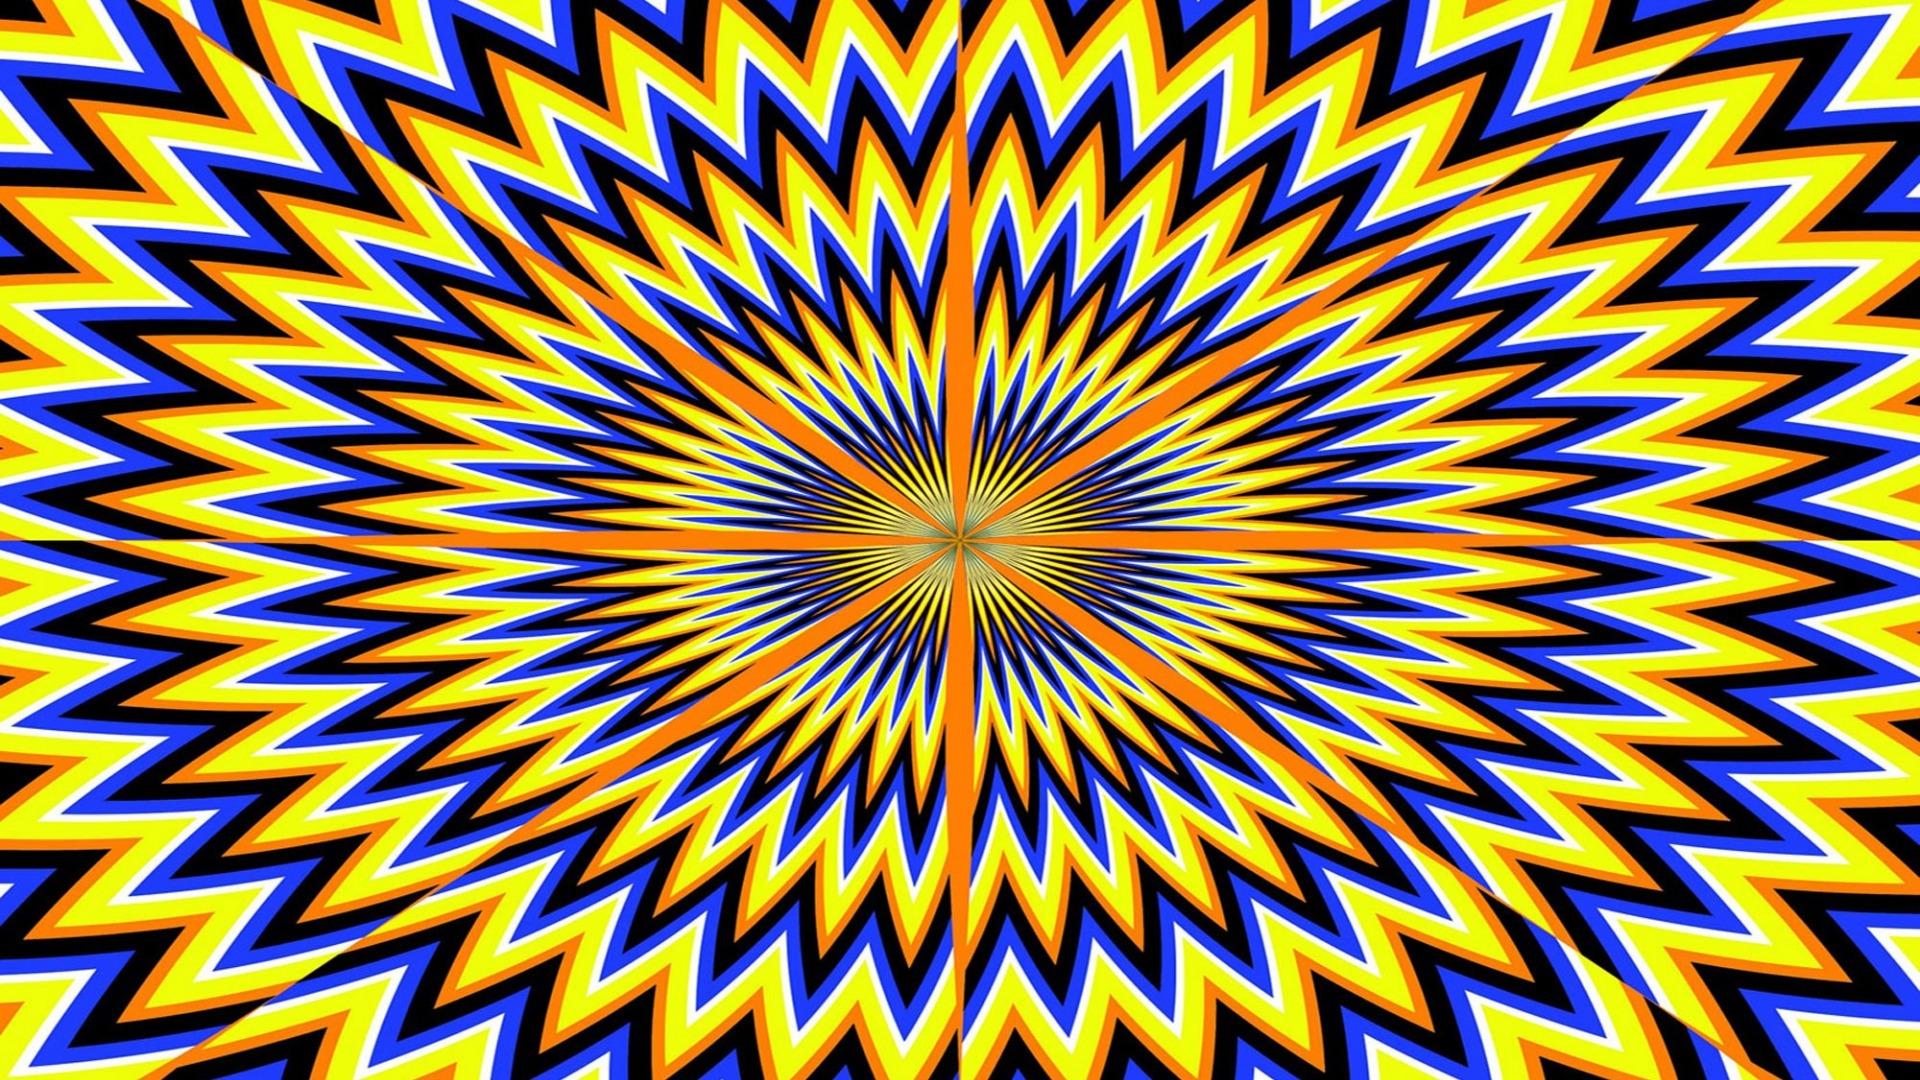 Wallpaper Optical Illusion Digital Art